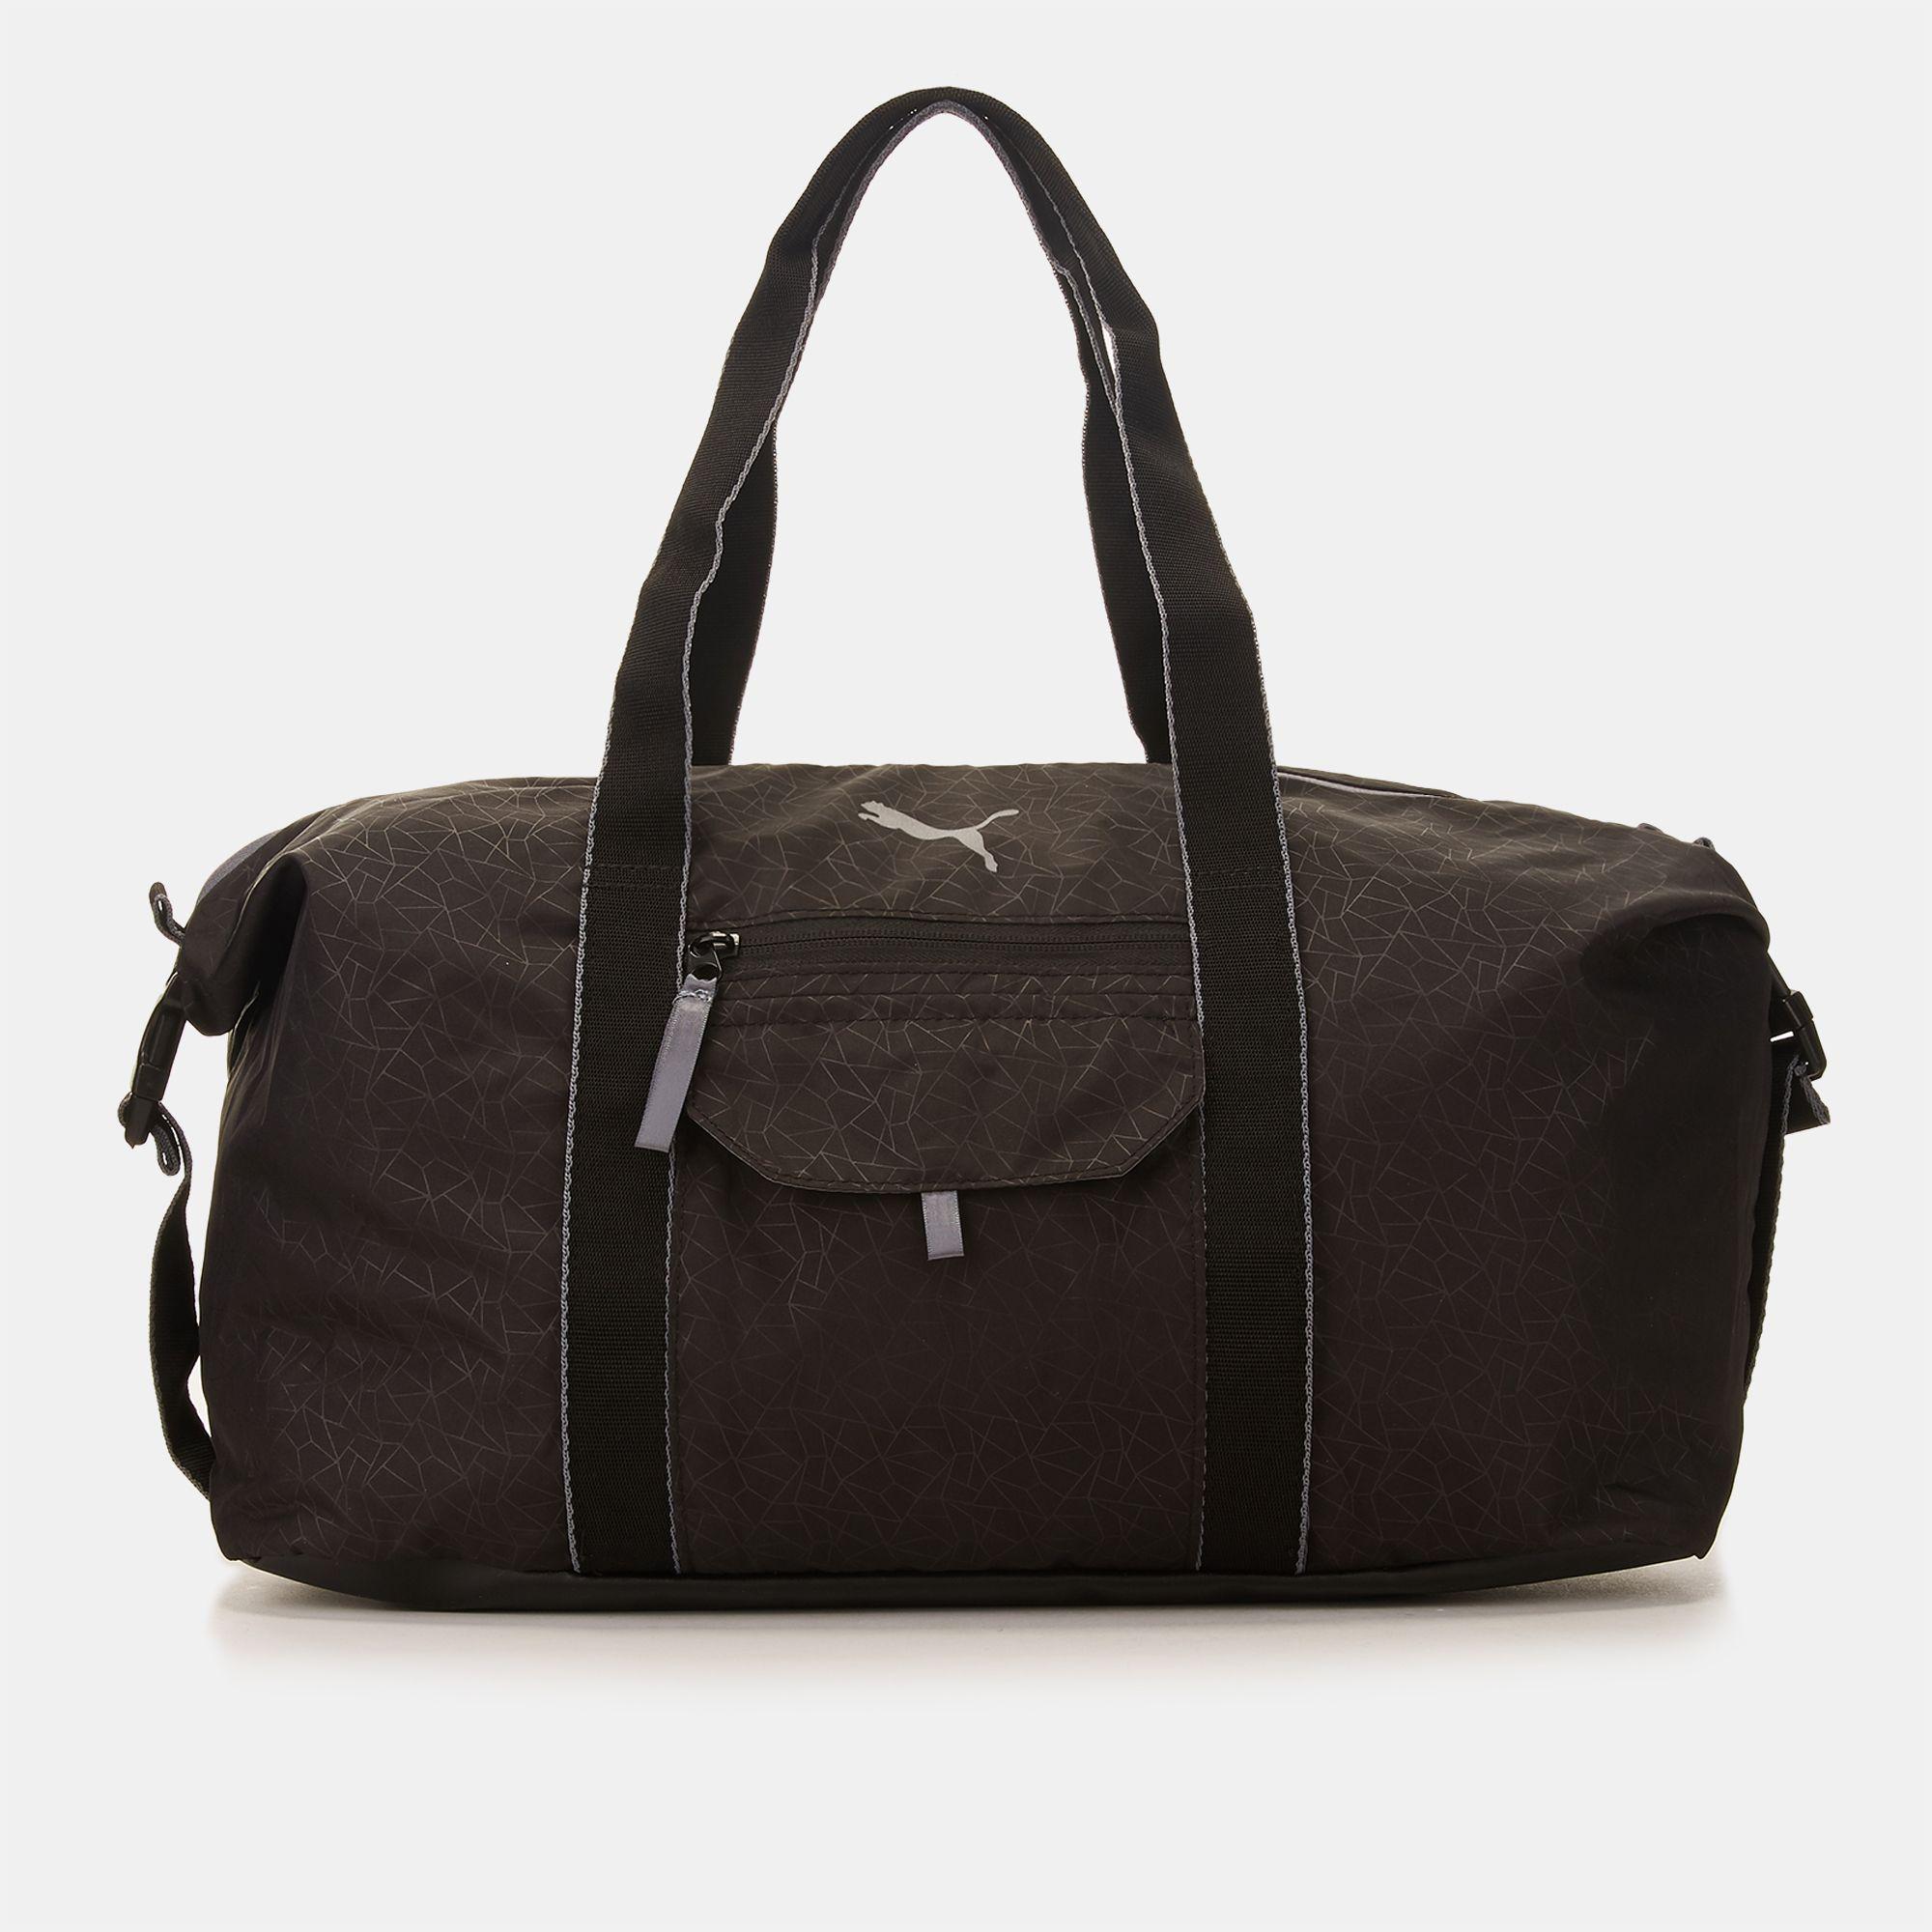 PUMA Fit At Workout Bag  51d8beefc65e1